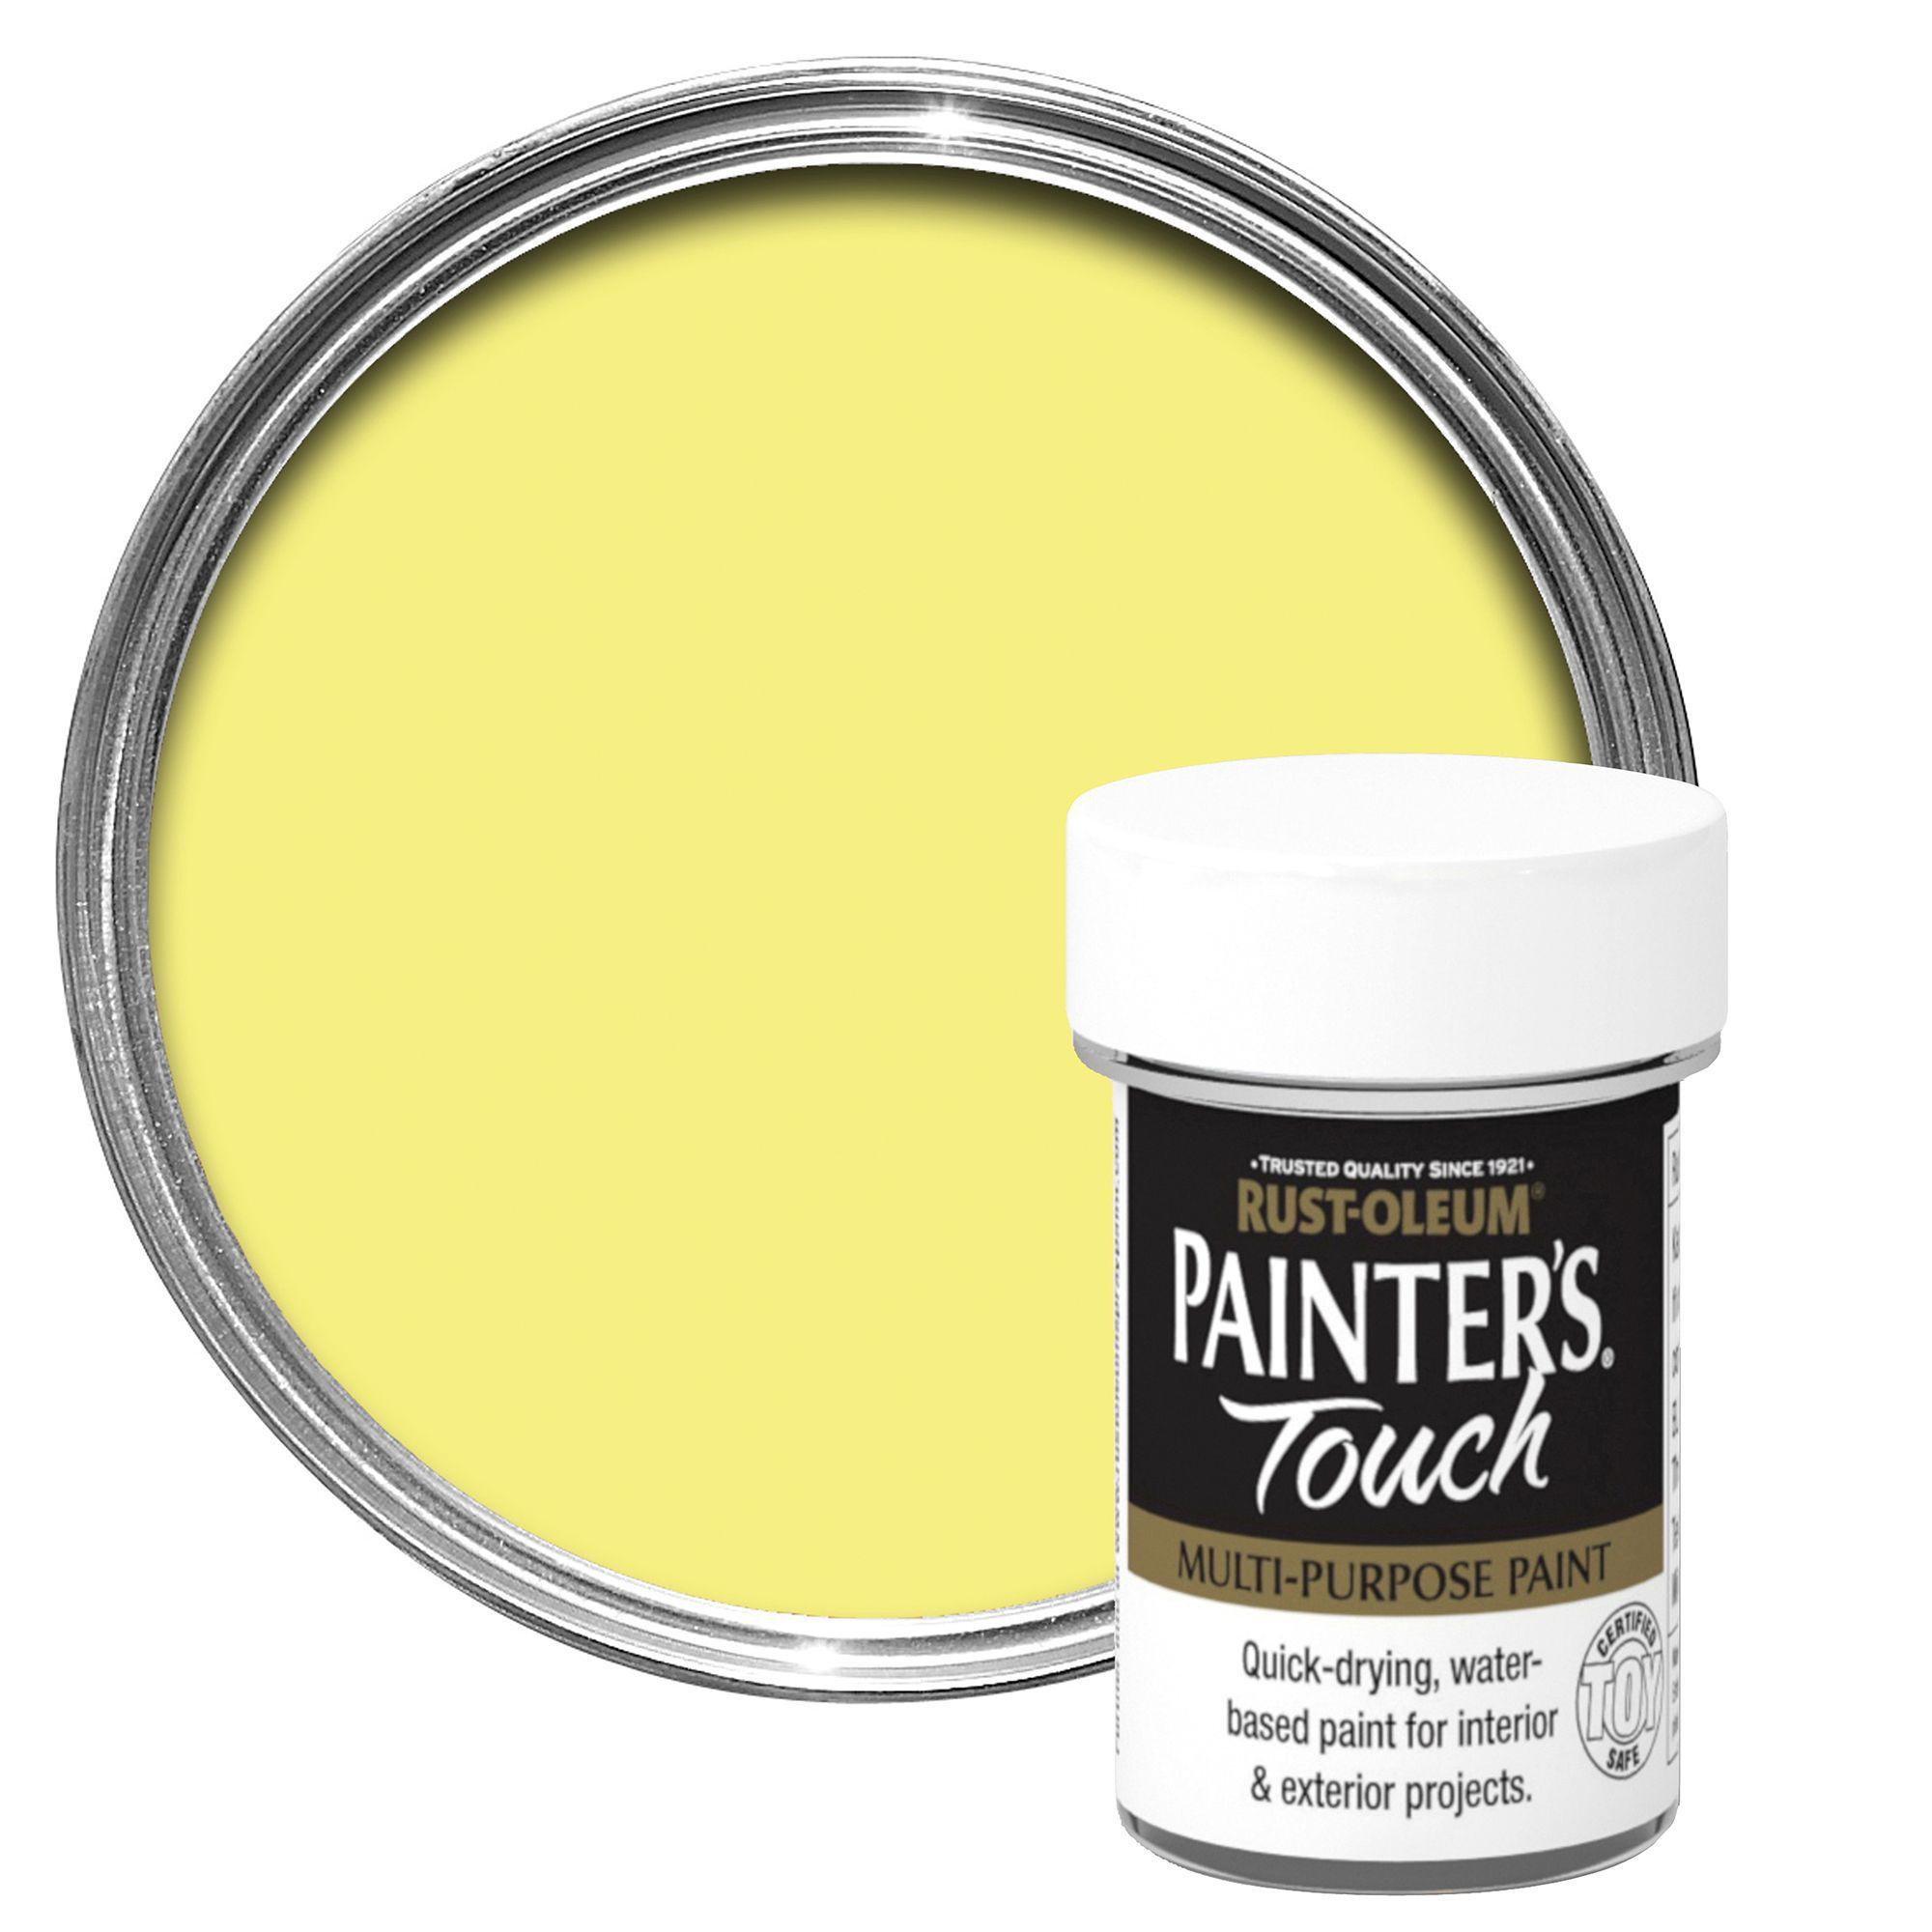 Rust oleum painter 39 s touch interior exterior lemon gloss multipurpose paint 20ml departments - Matt exterior paint image ...